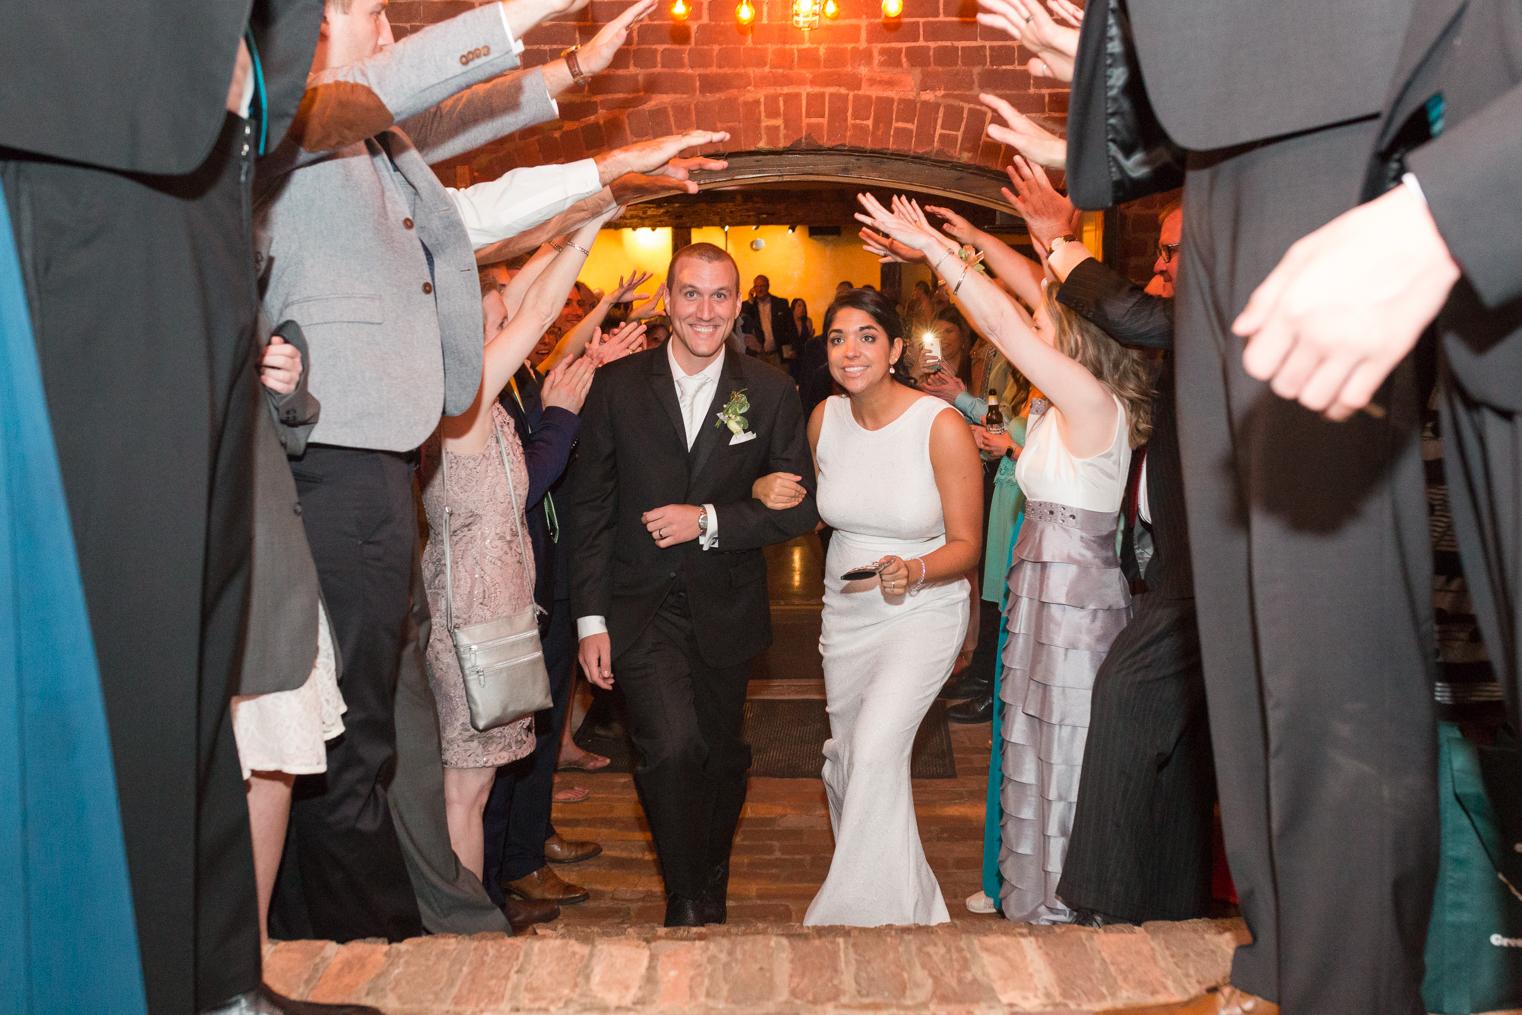 170527-MM-Old-Cigar-Warehouse-Wedding-907.jpg